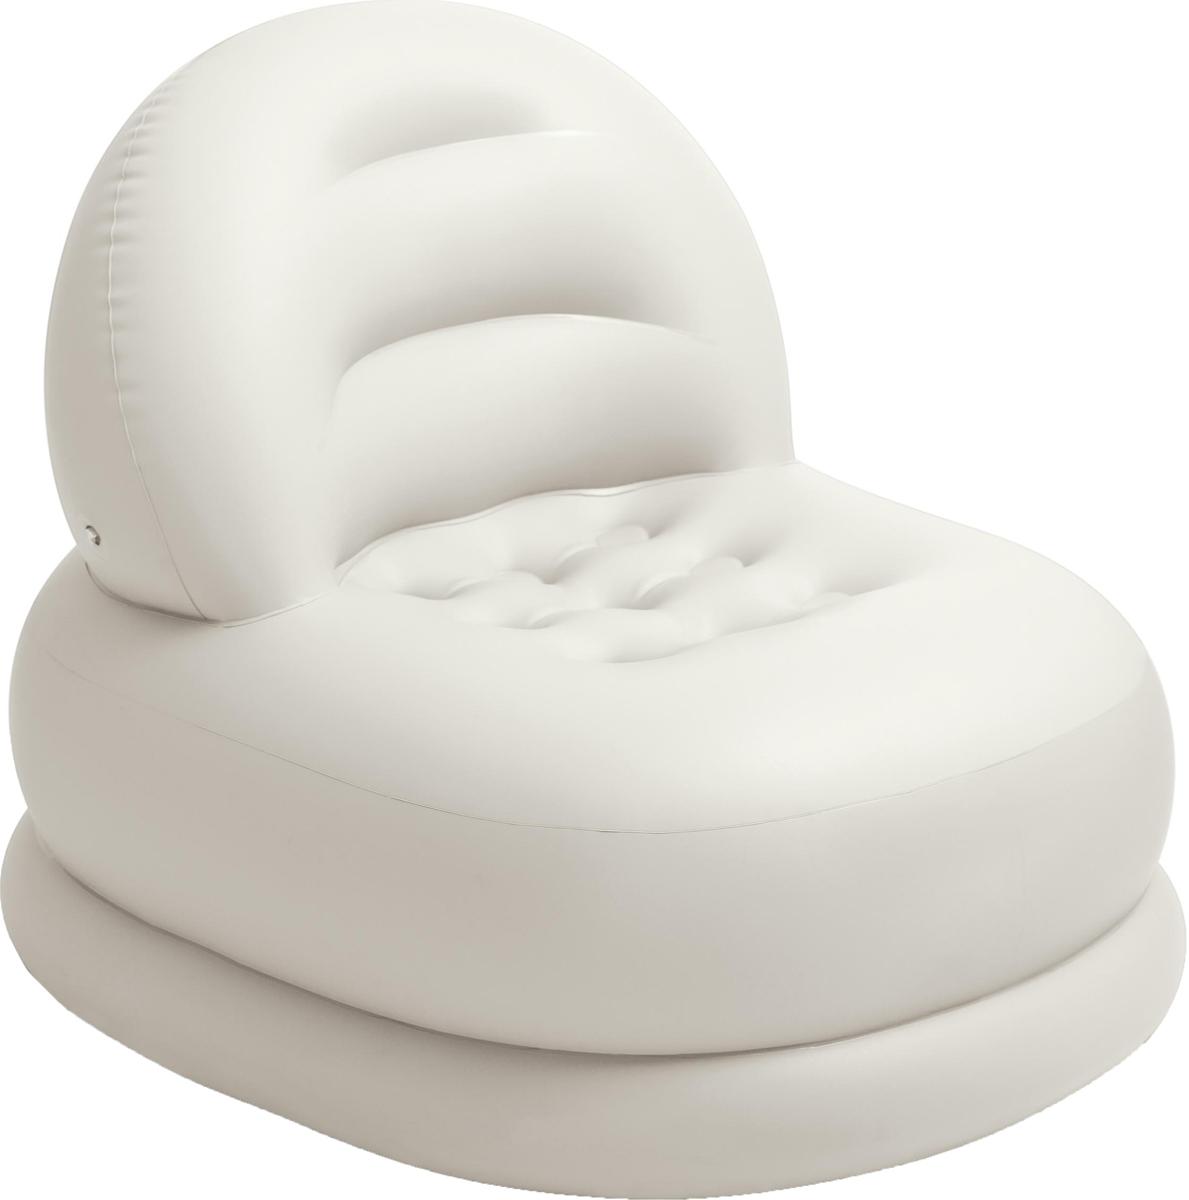 Кресло надувное Intex Mode Chair, 84 х 99 х 76 см цена